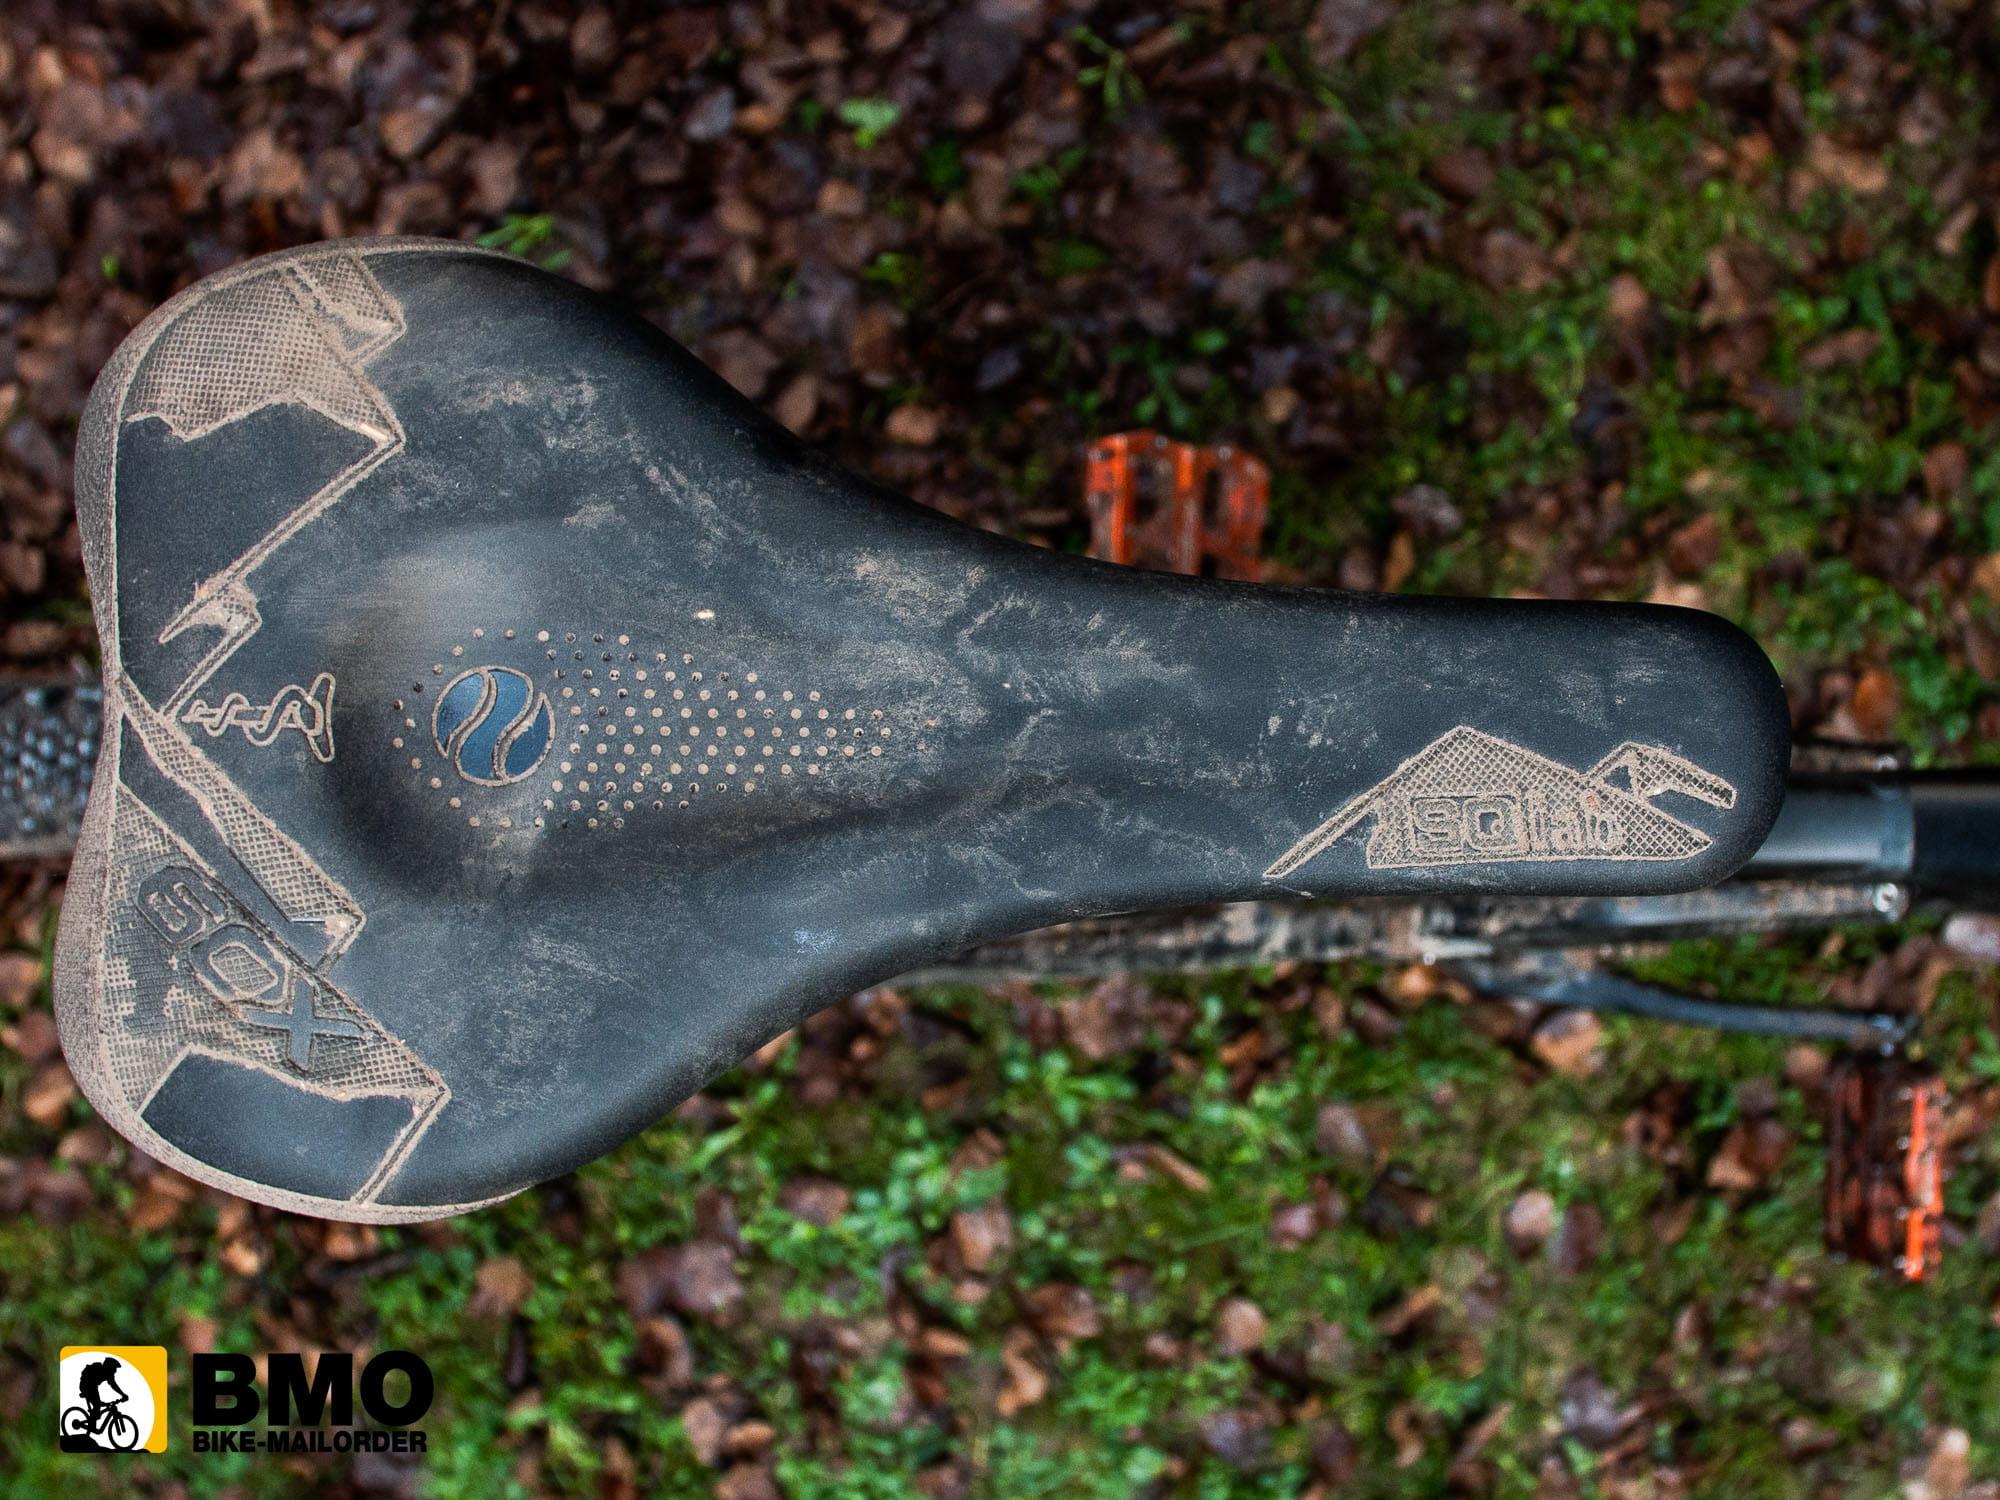 BMO-Bike-Mailorder-SQ-Lab-Sattel-6